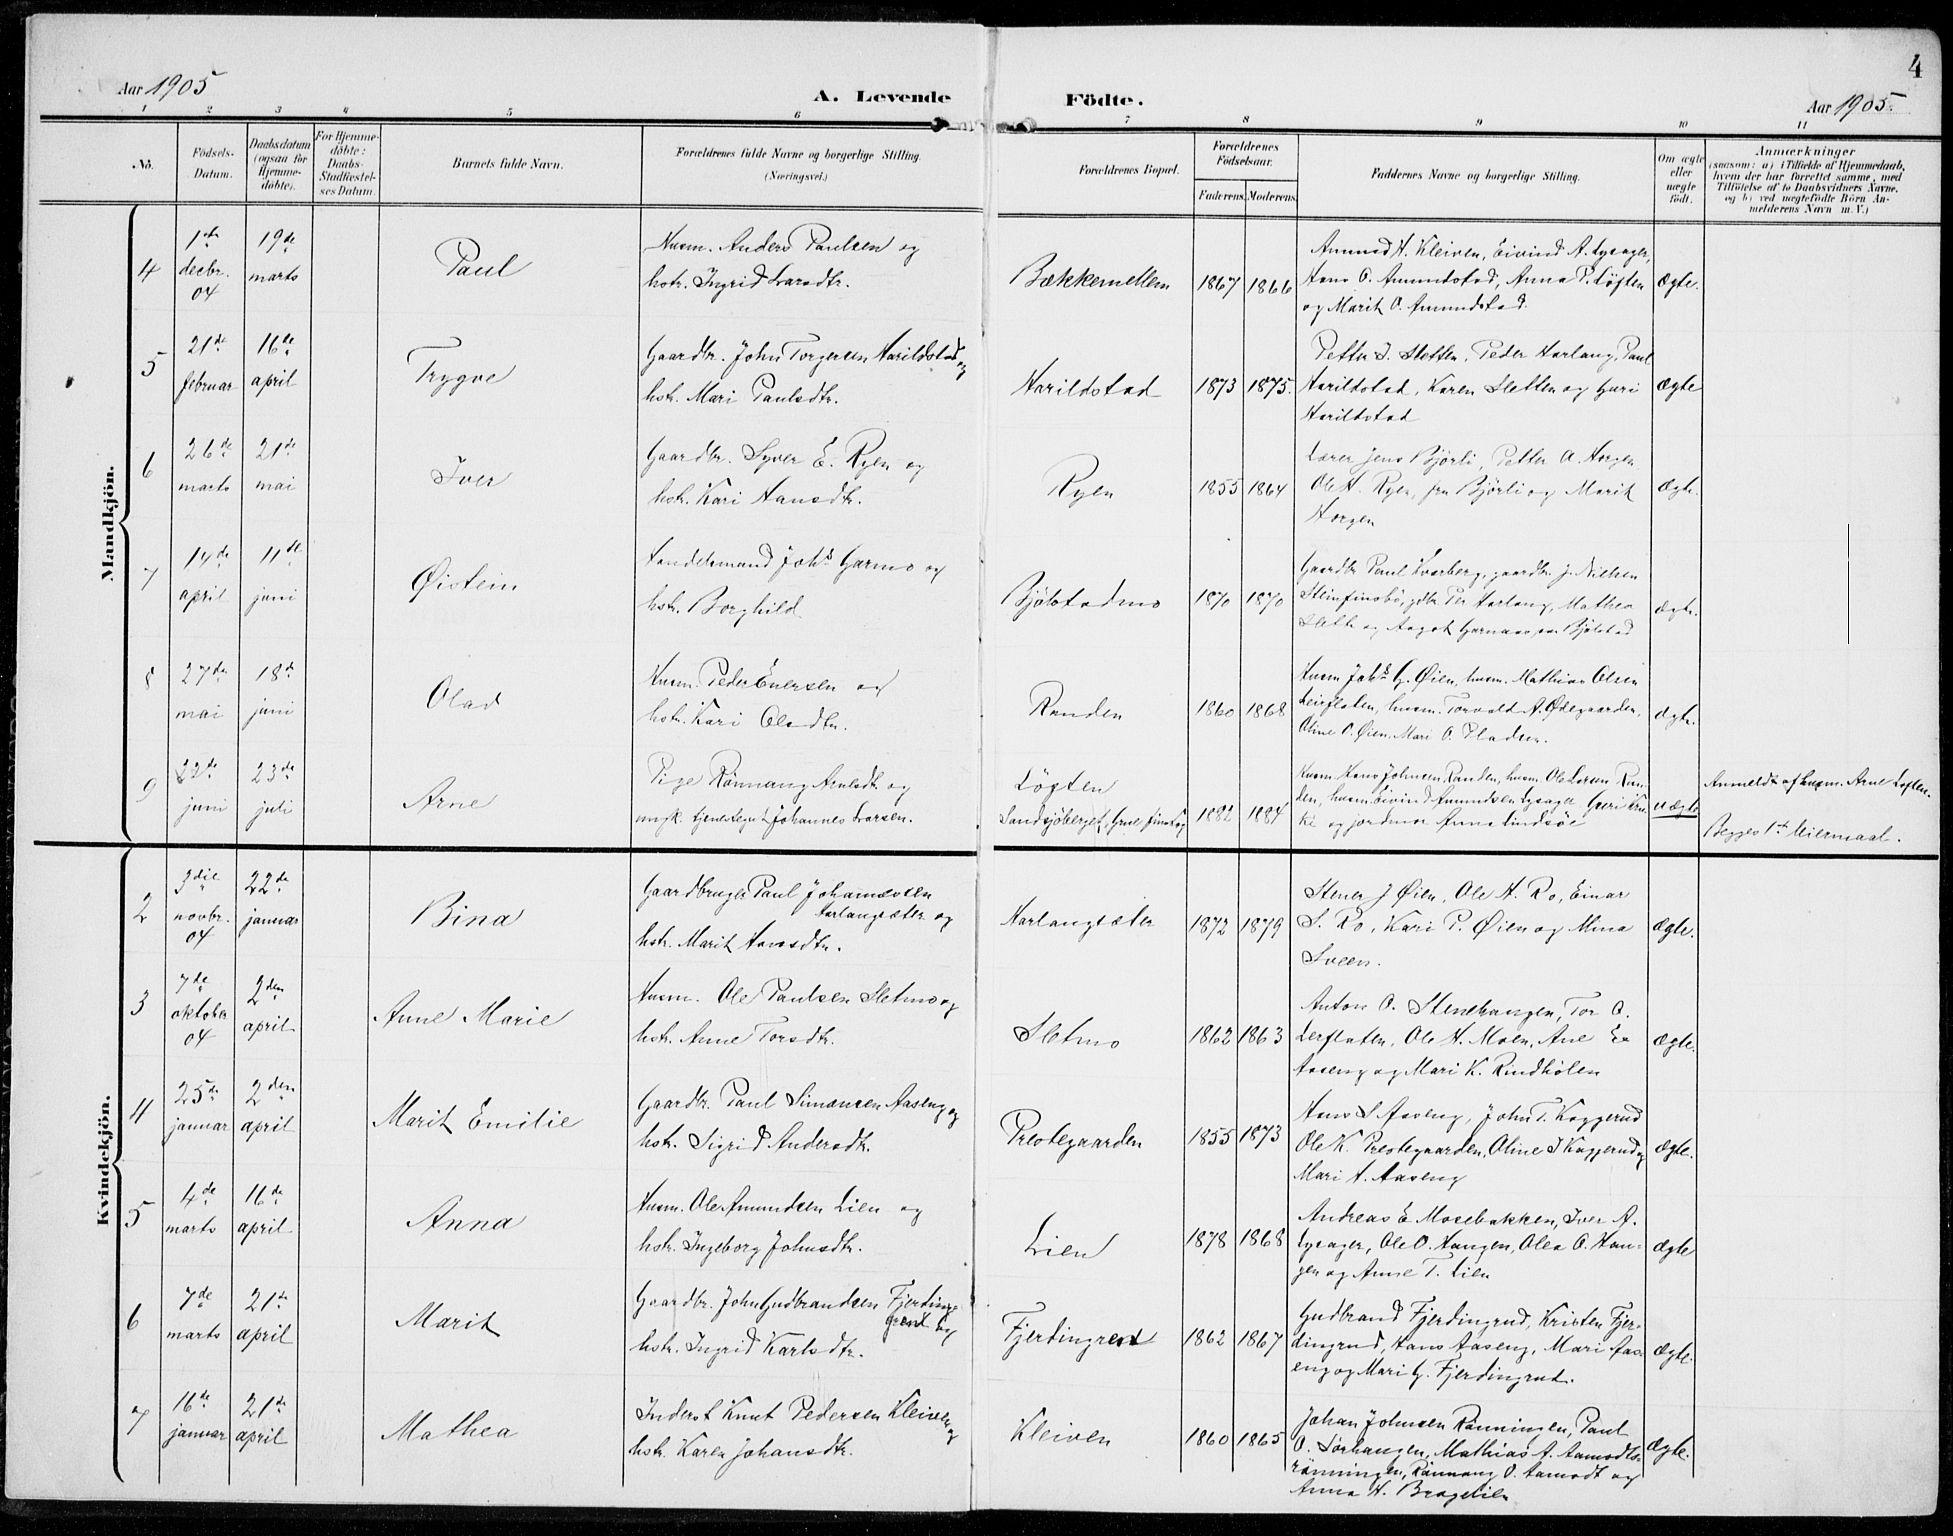 SAH, Sel prestekontor, Ministerialbok nr. 1, 1905-1922, s. 4